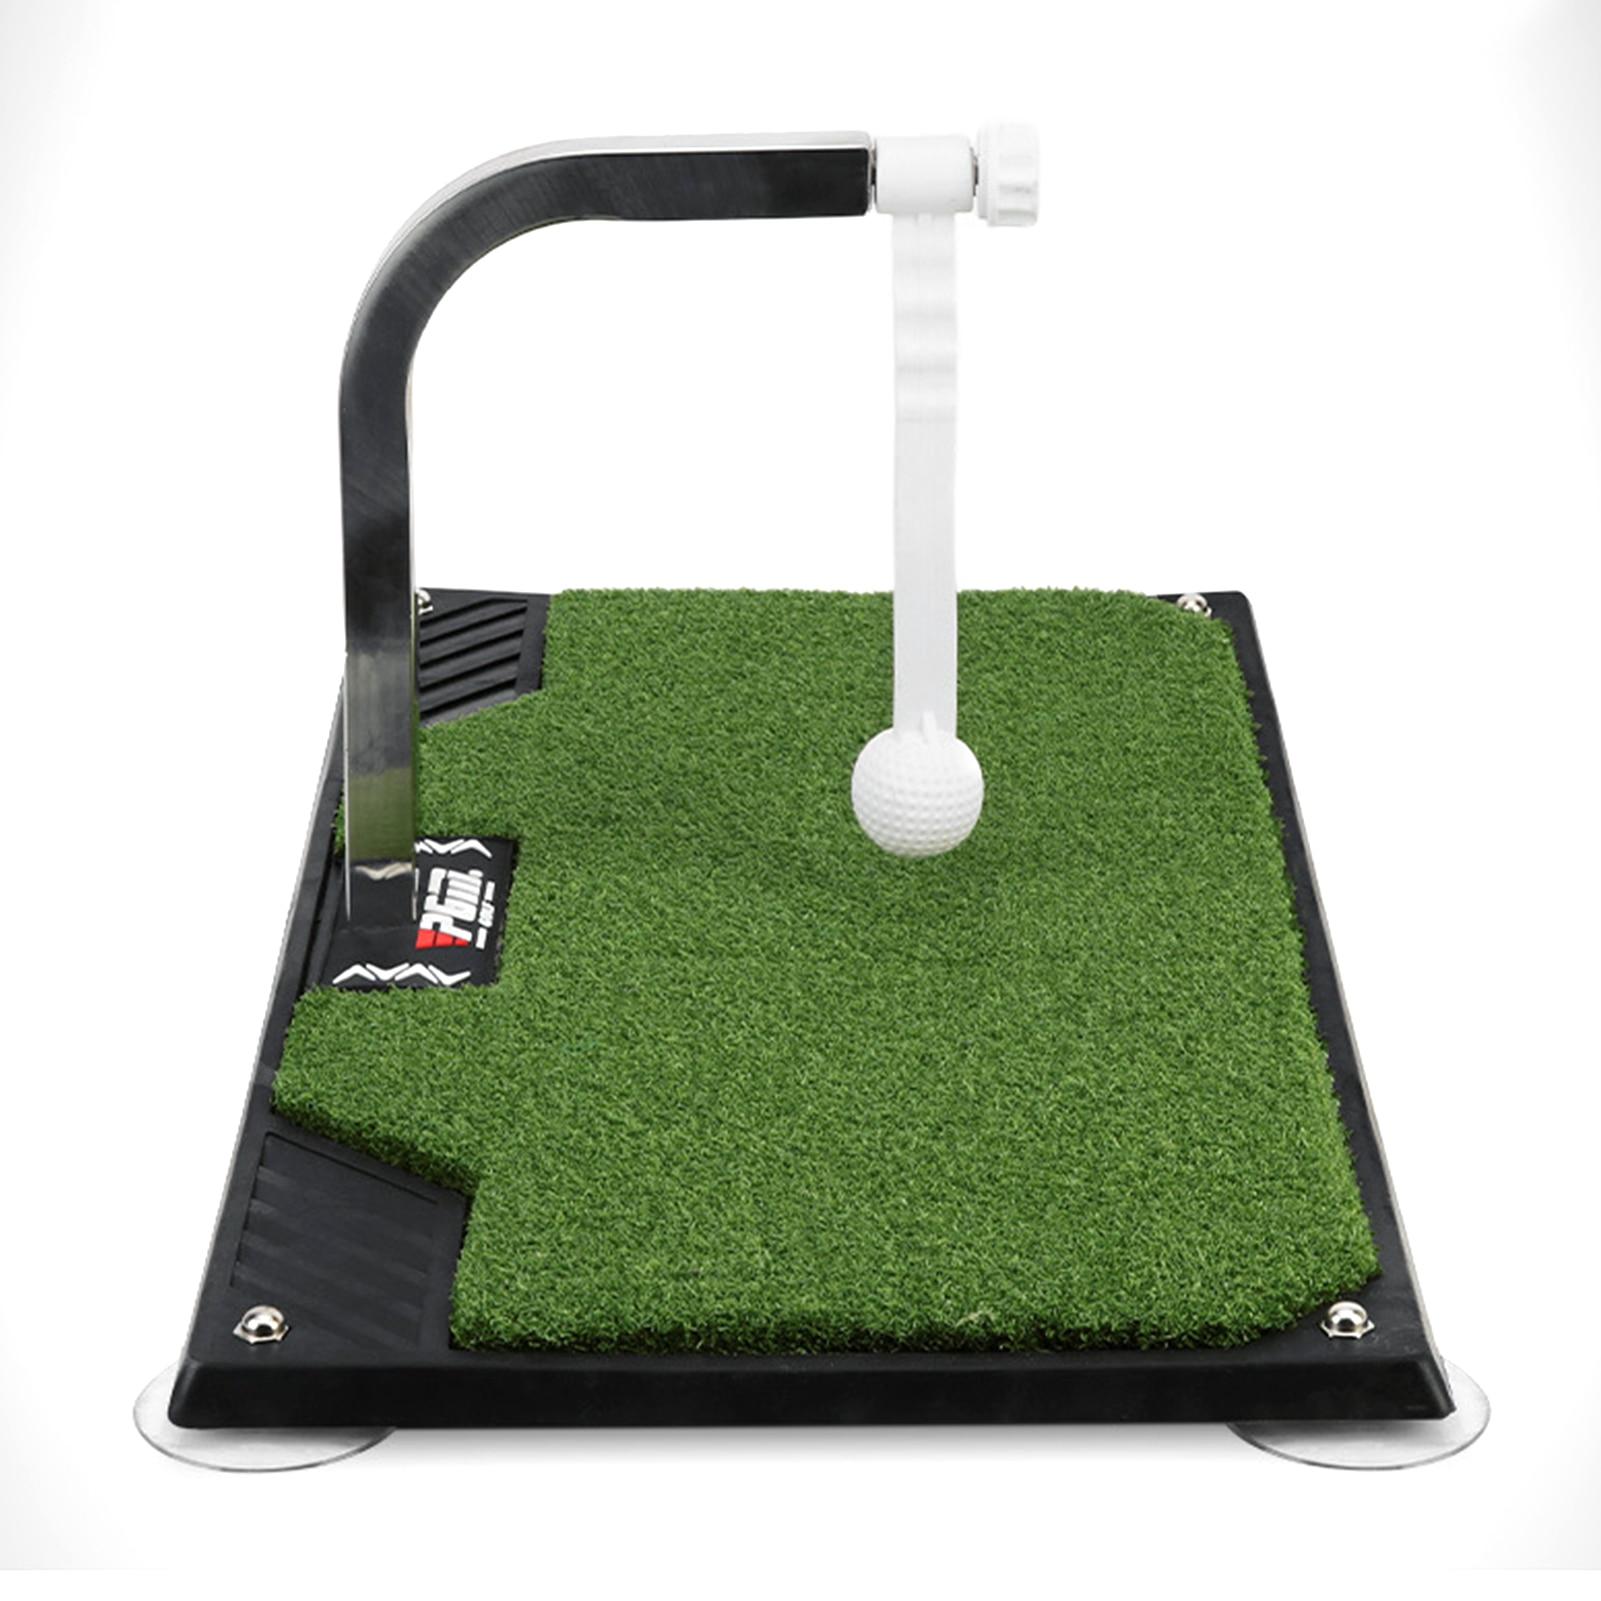 62 X 33.5 X 23.5cm Golf Swing Putting 360 Rotation Golf Practice Putting Mat Golf Putter Trainer Green  Beginners Training Aids